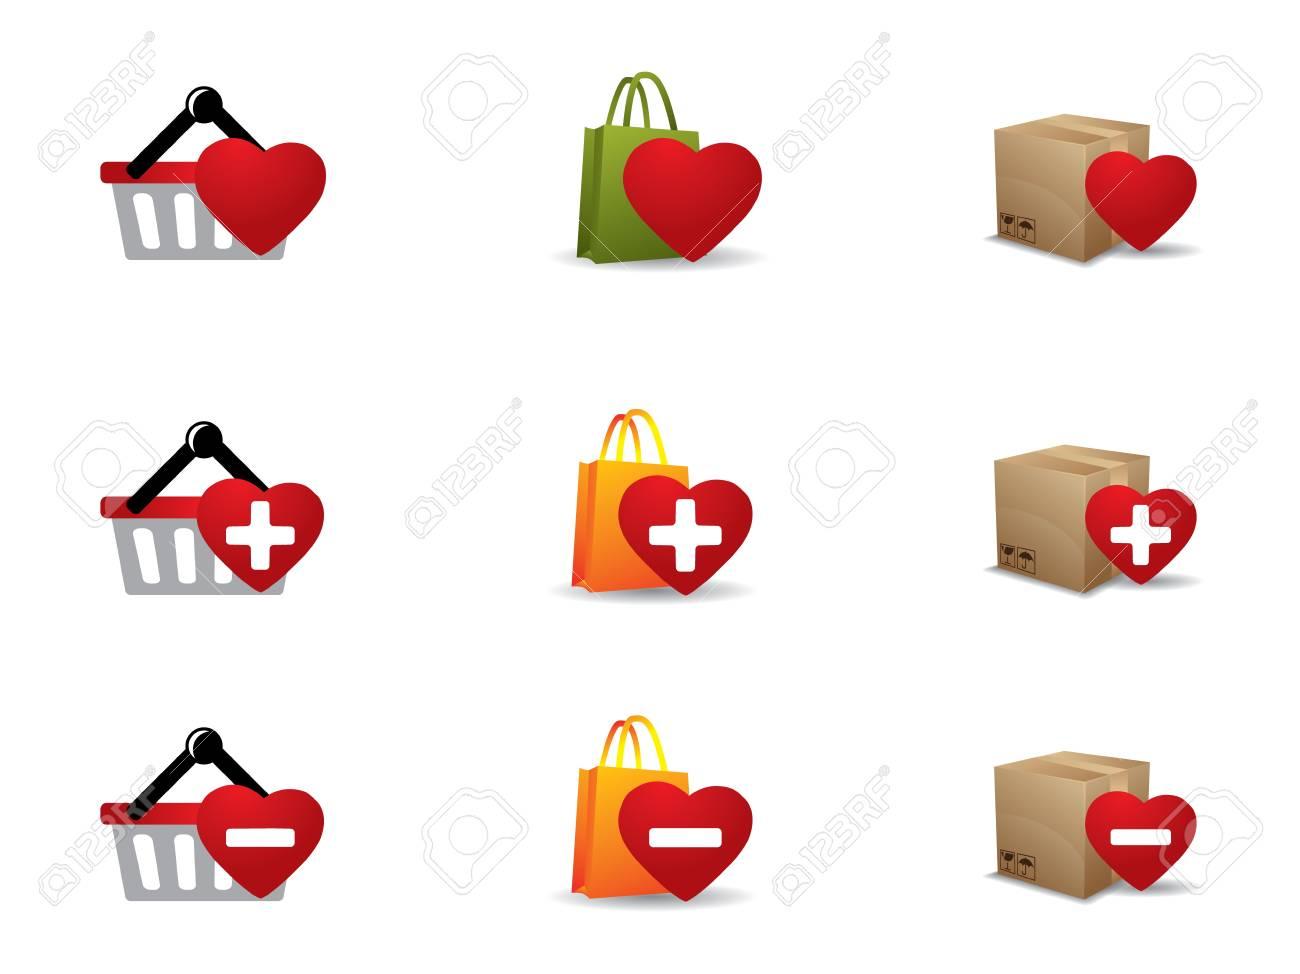 Valenintes day Shopping icons set Stock Vector - 17304507